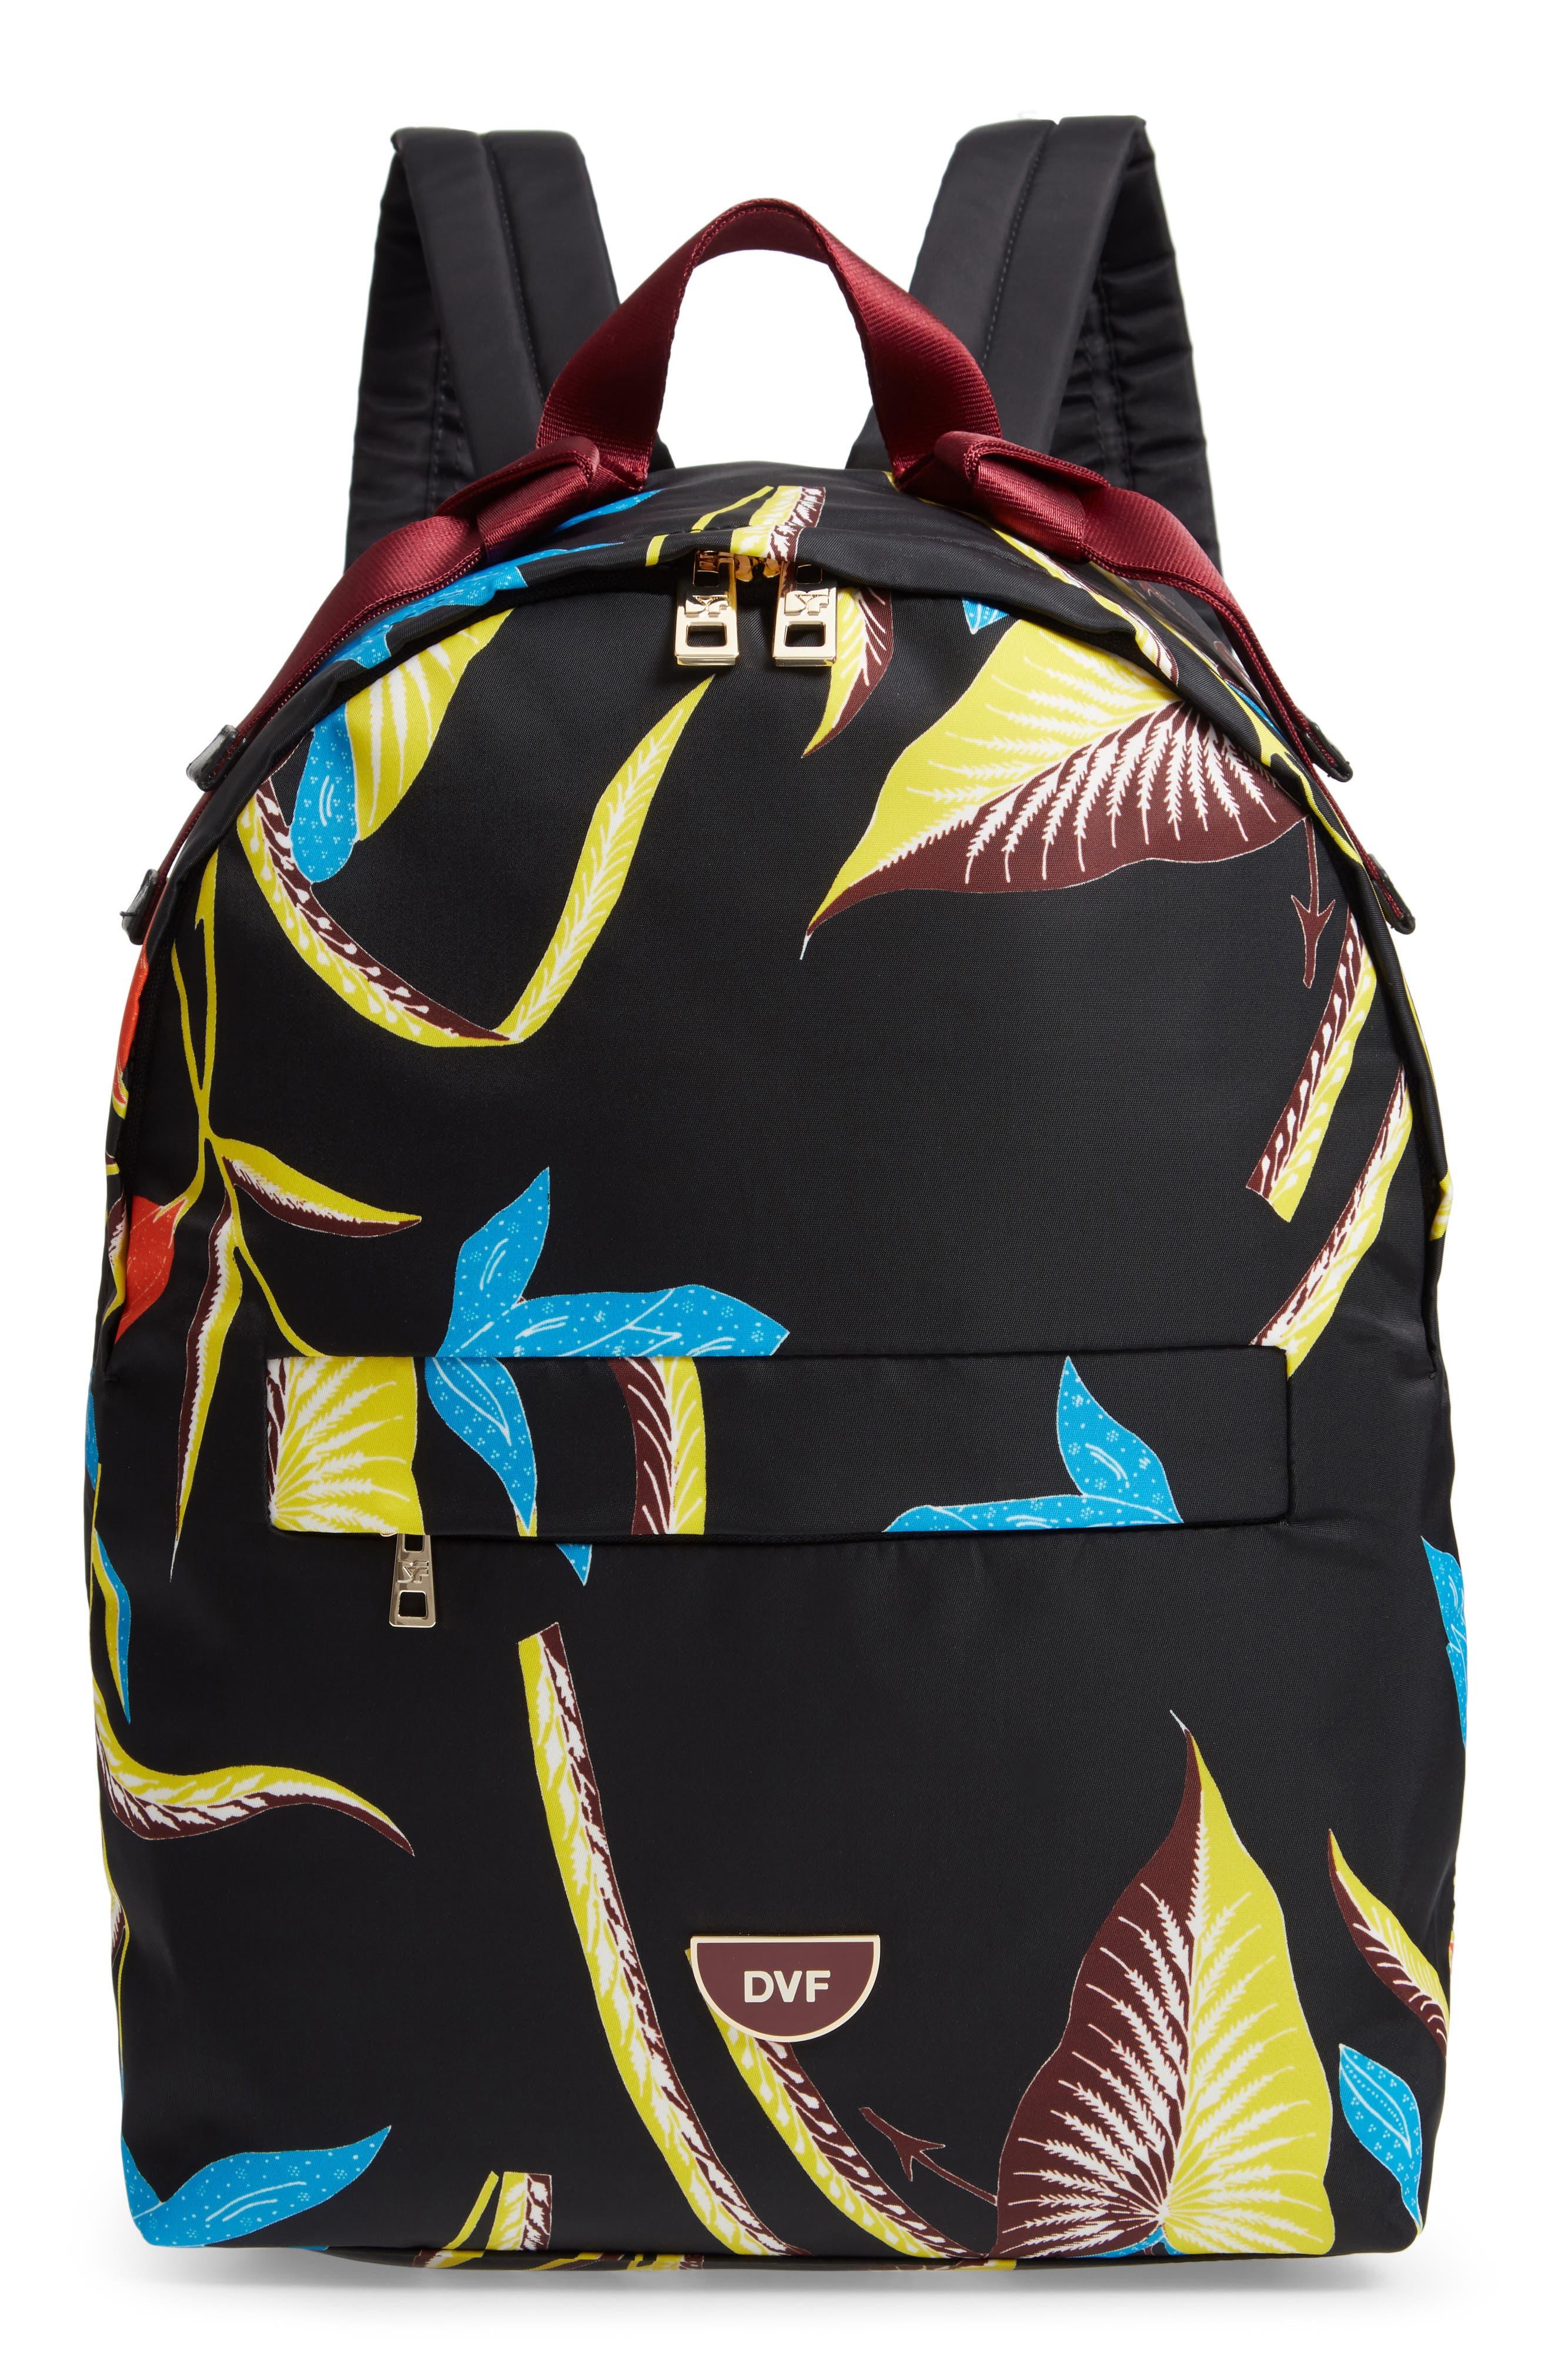 DVF Print Nylon Backpack,                         Main,                         color, OSWALD BLACK